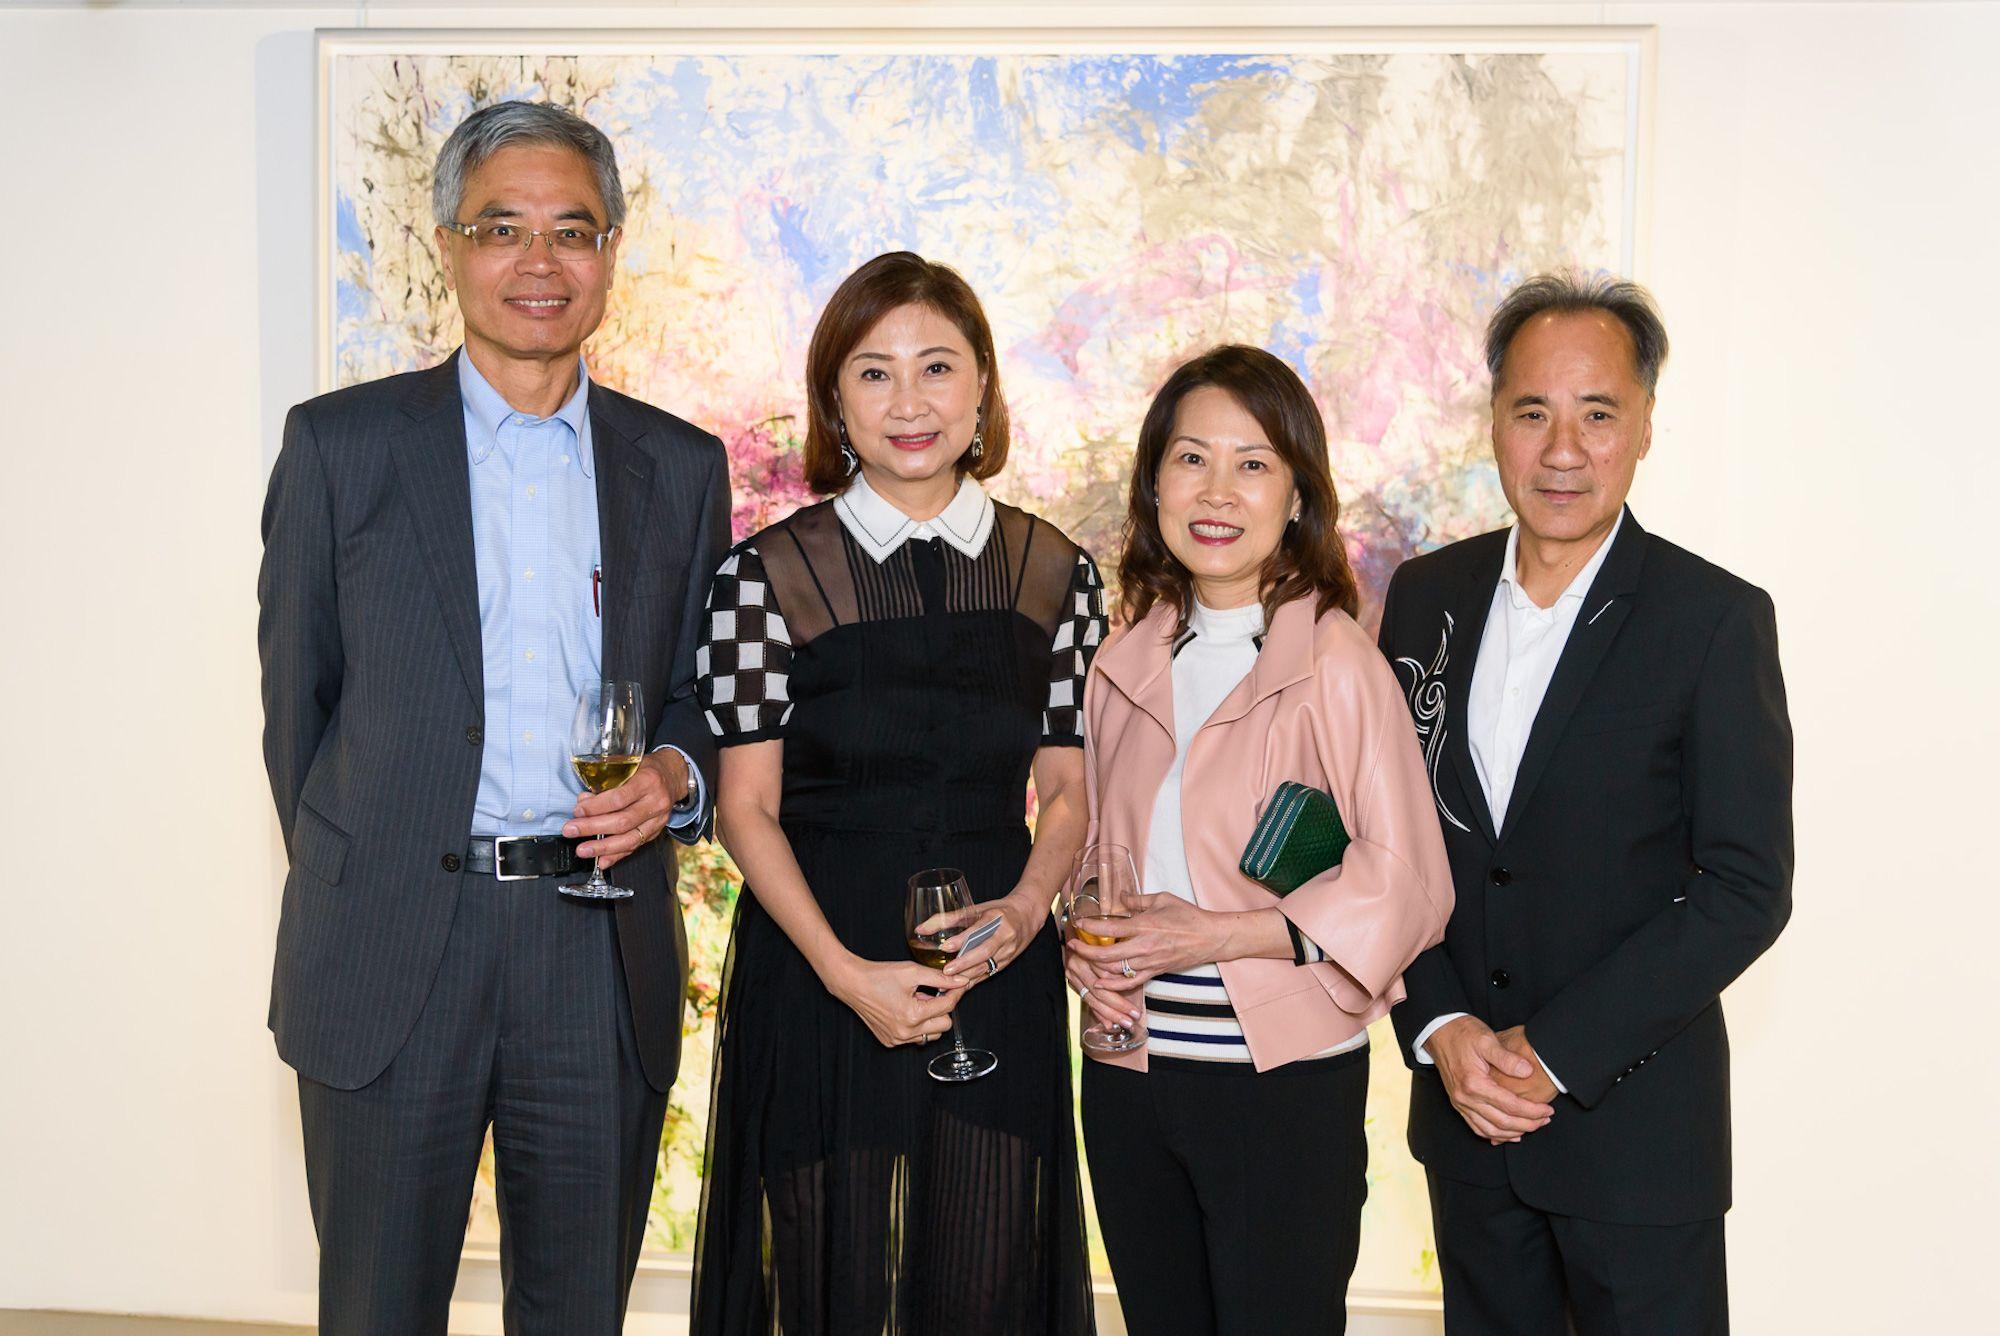 Wei Shyy, Catherine Kwai, Yuchen Shyy, Edward Fung